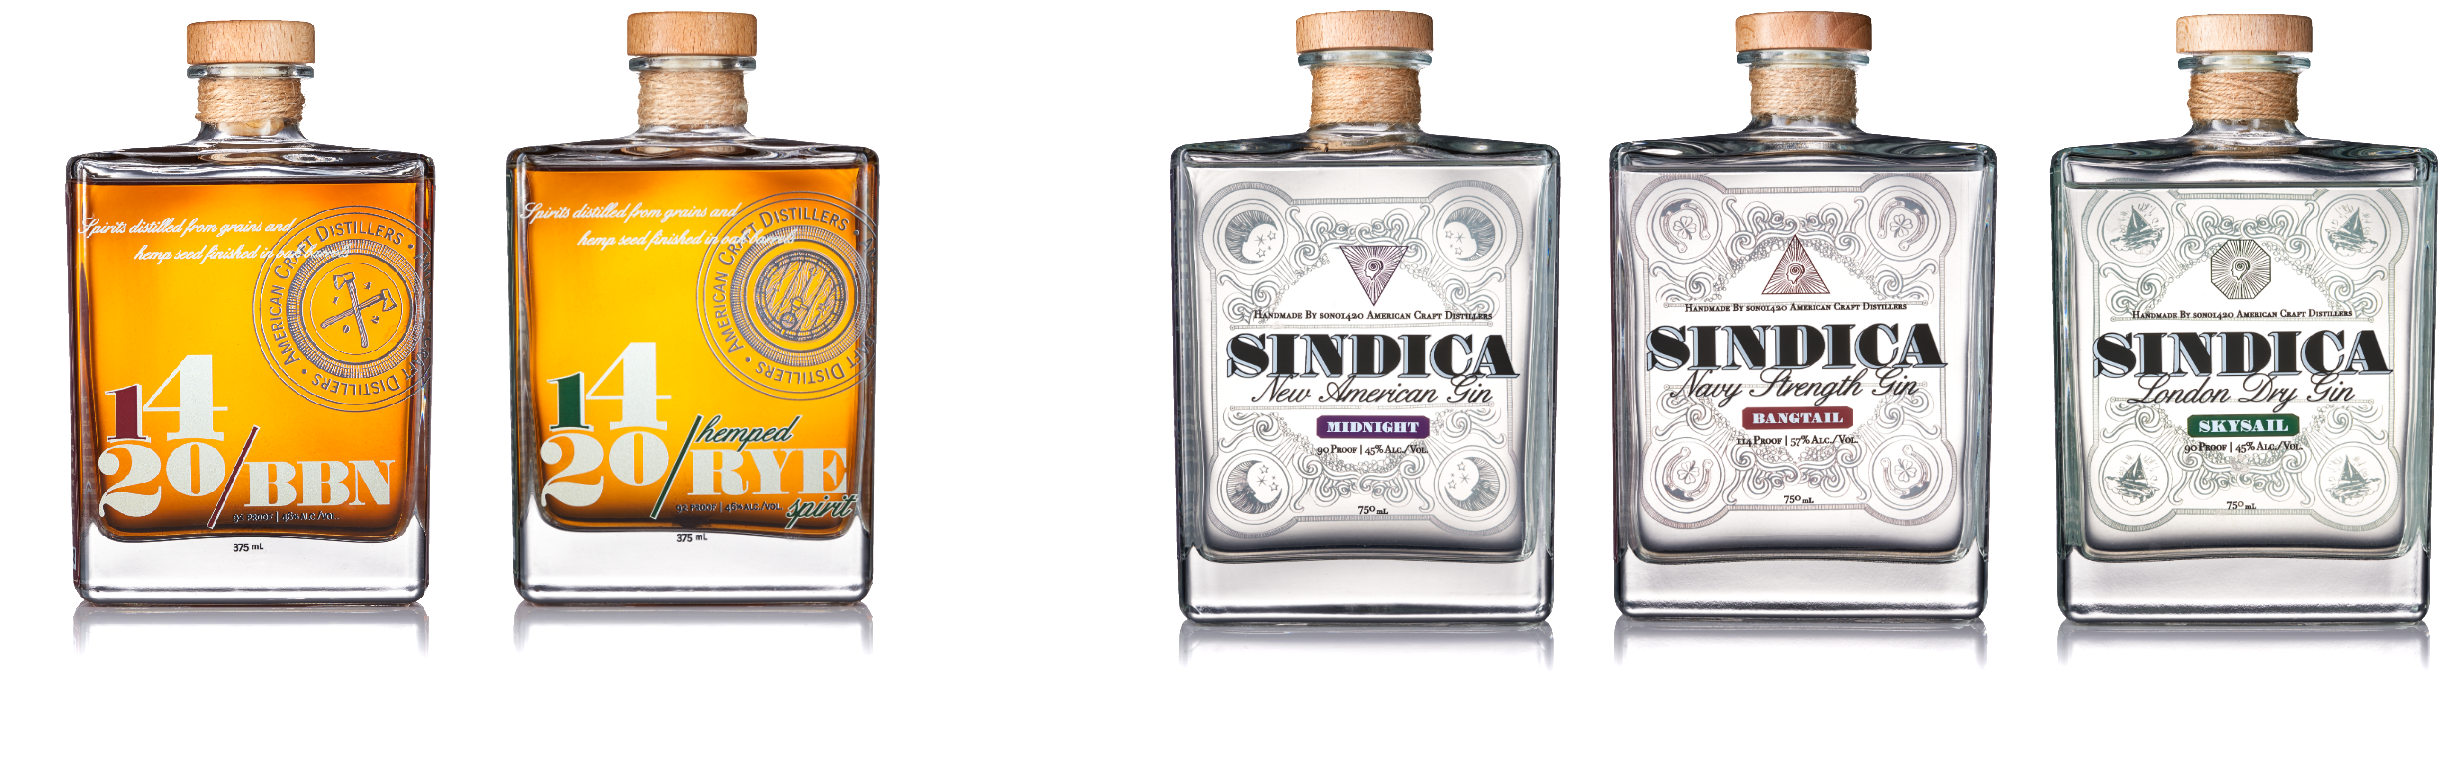 2 whisky 3 gin 2400 x 610 v2.png sono 1420 gin whiskey hemp whisky sativa indica bangtail midnight skysail